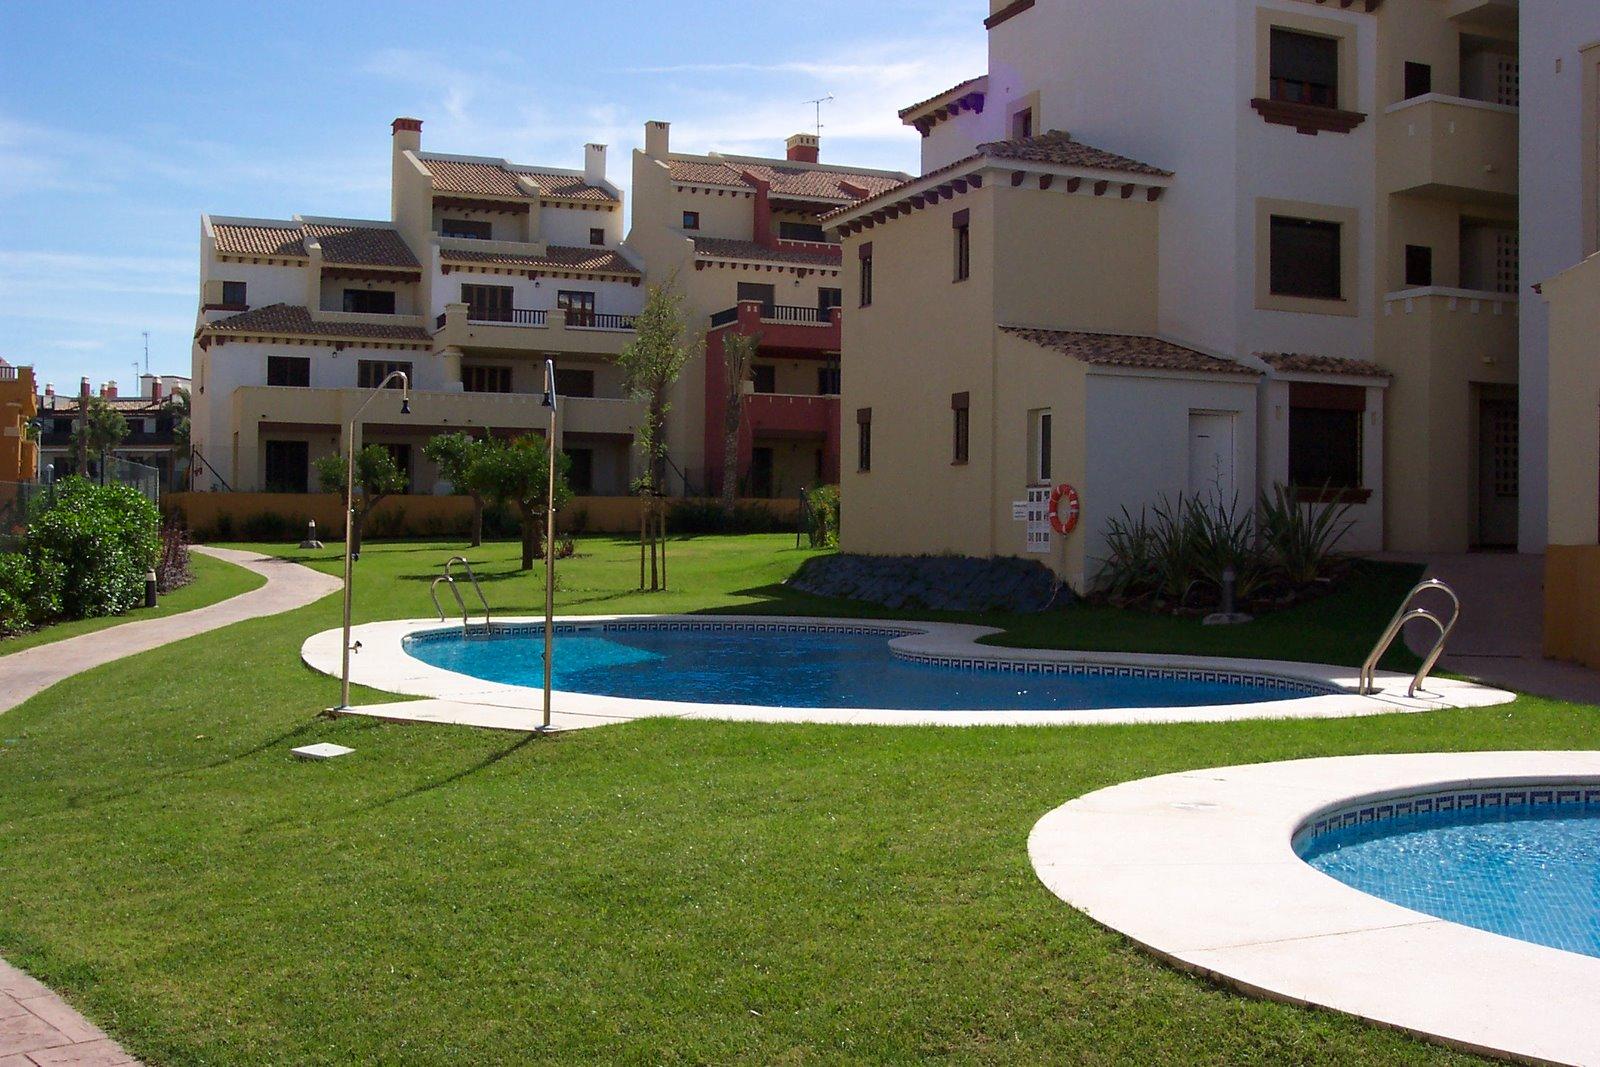 Mantenimiento de piscinas en huelva siempreverde jardiner a for Jardineria huelva